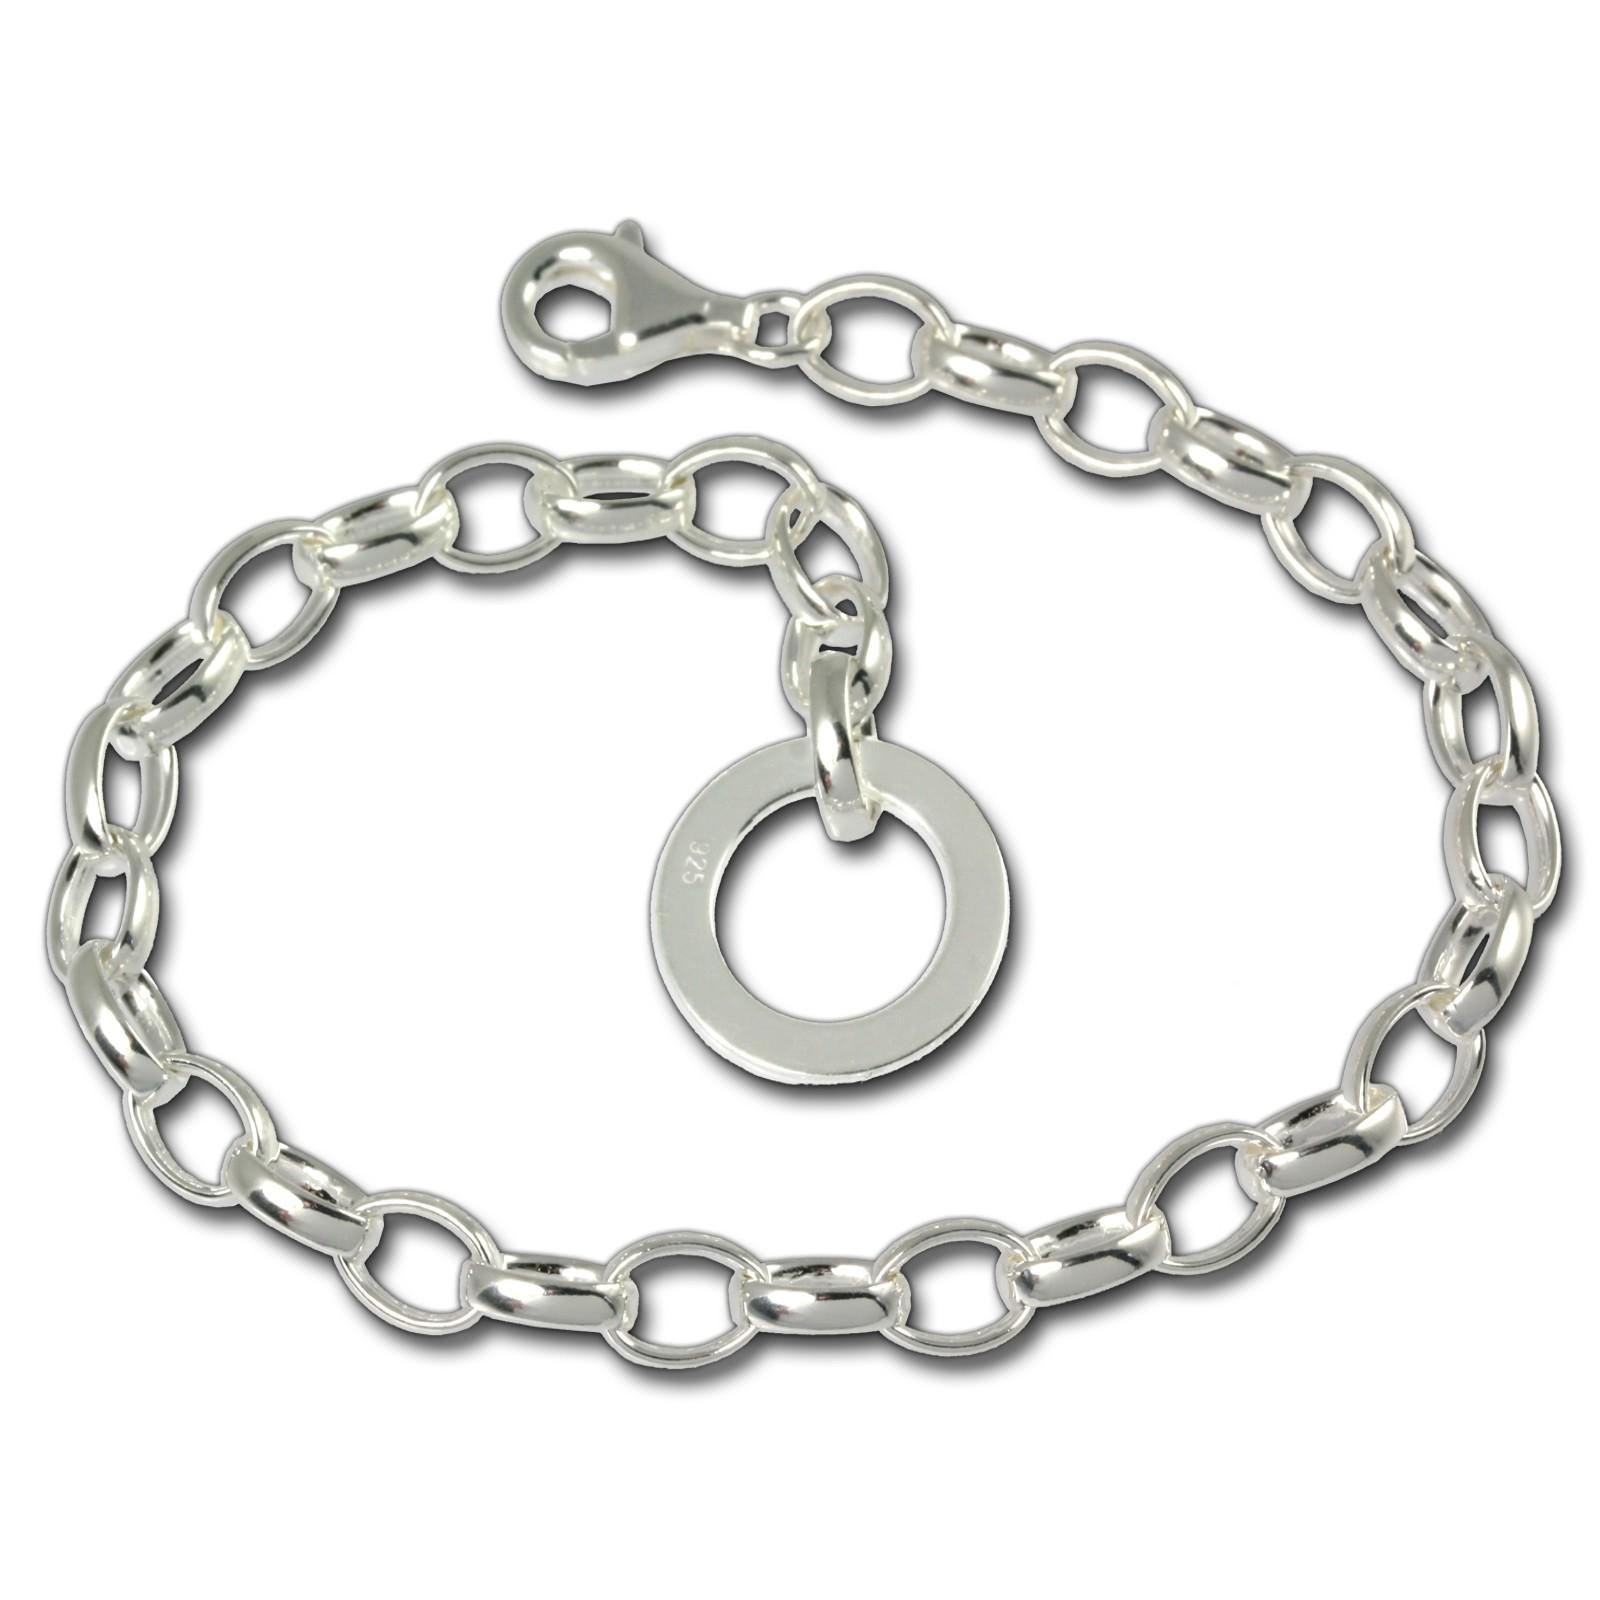 SilberDream Armband mit Plakette 925 Silber Charm Bettelarmband 19cm FC0702